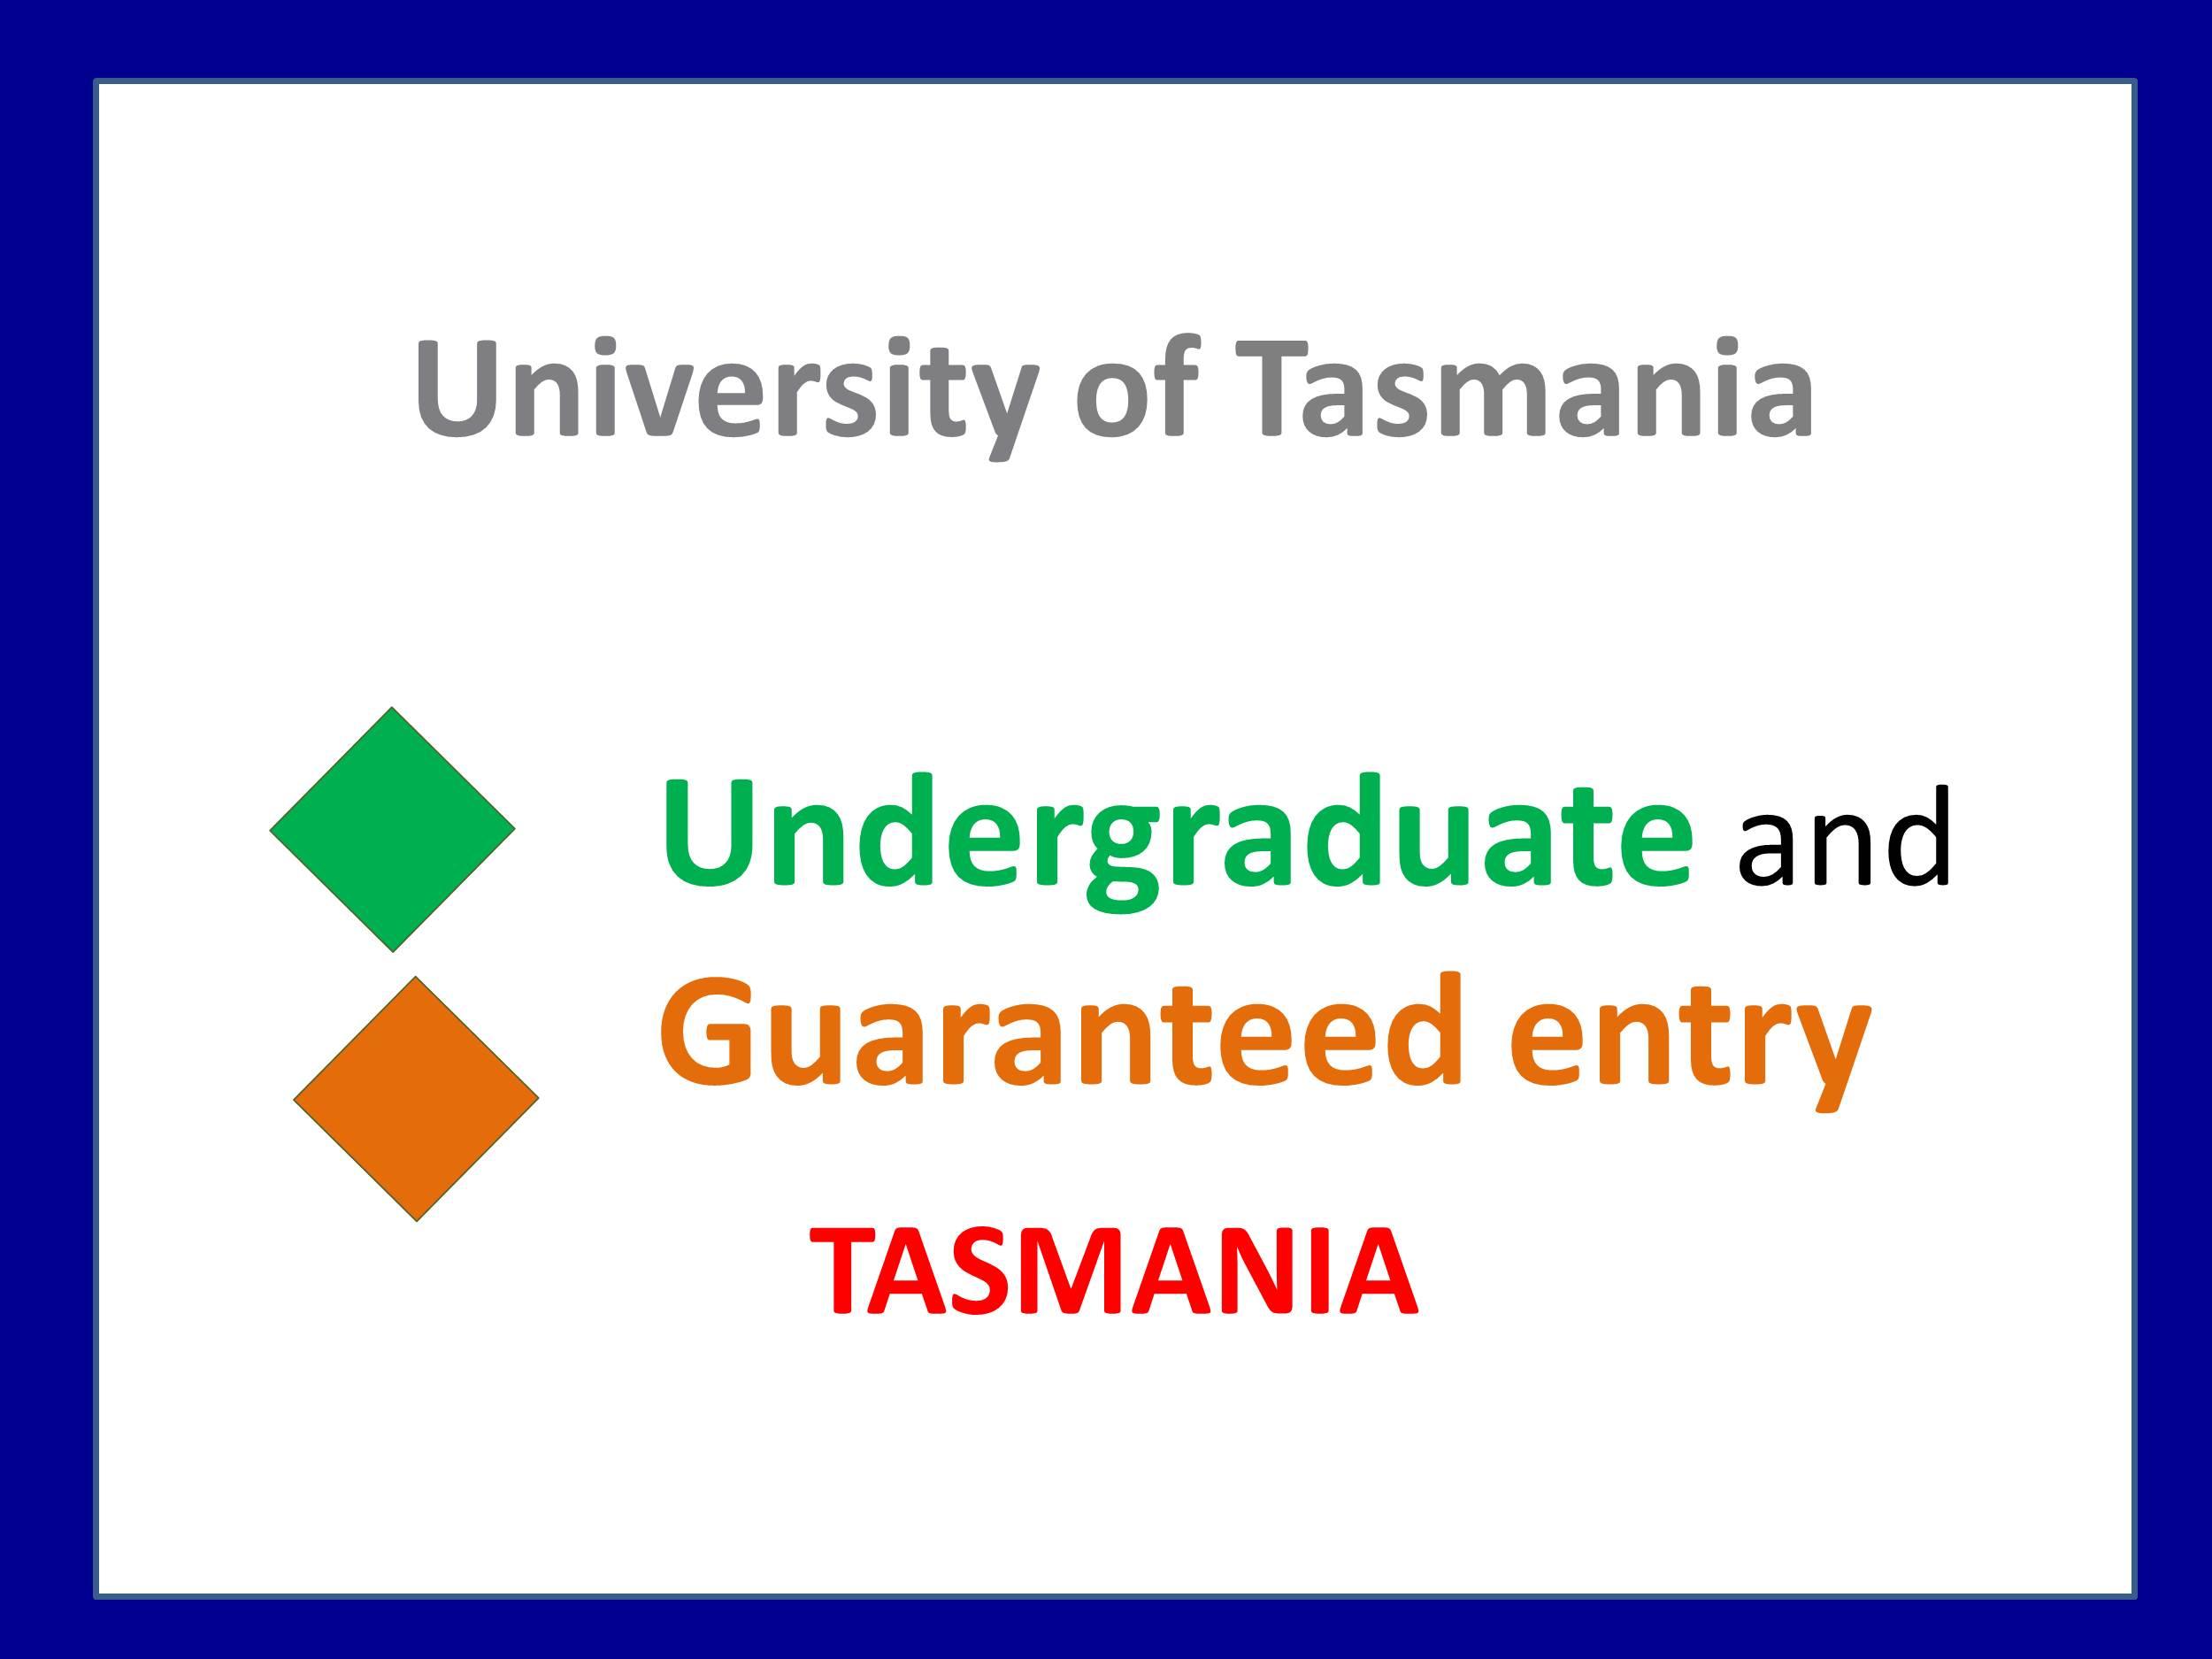 University of Tasmania medicine